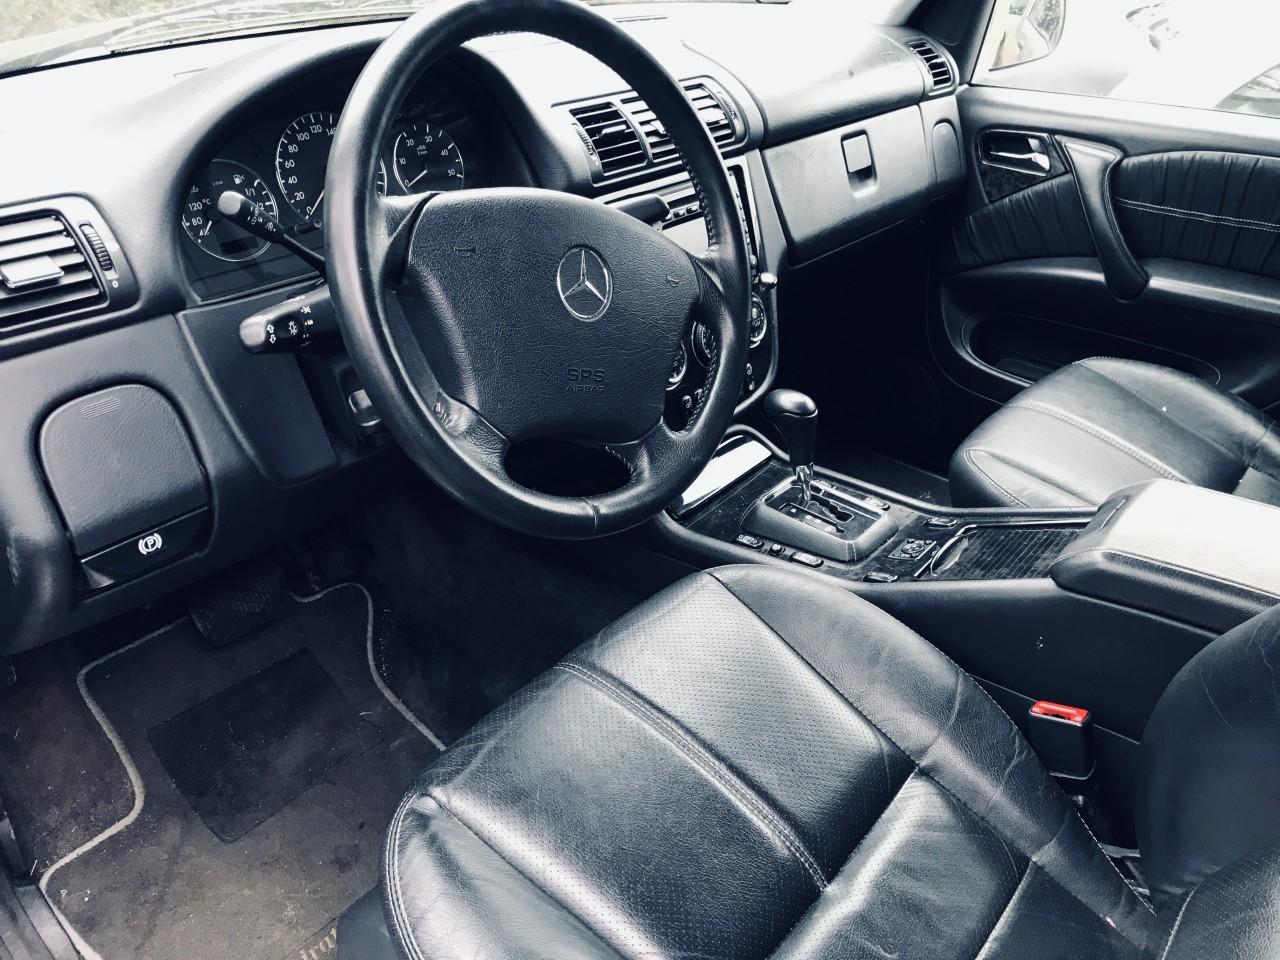 Mercedes ML 400 4000 CDI 2003